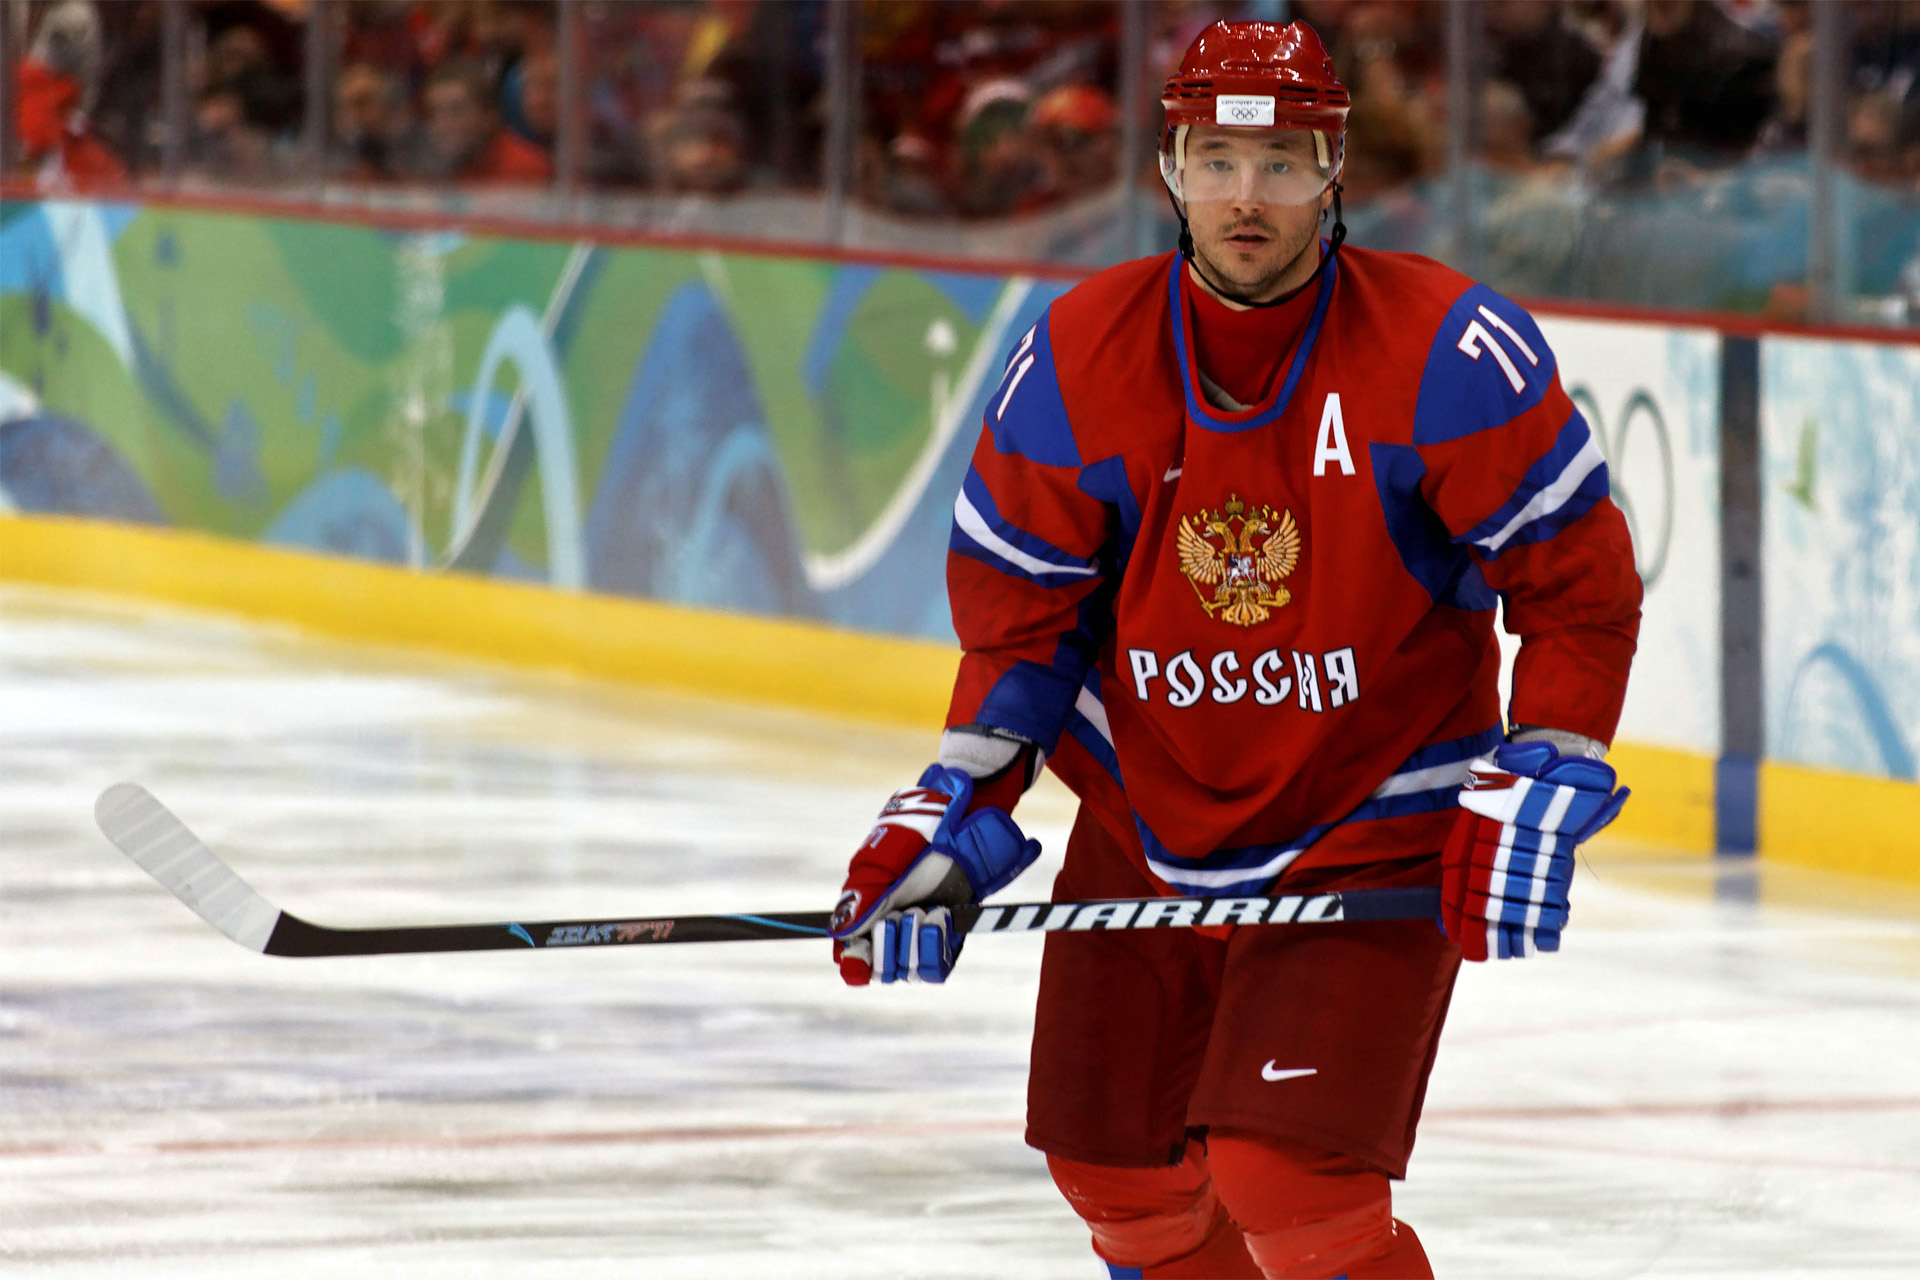 Former Capital, NHLer Kovalchuk Named GM Of Russian Olympic Committee Hockey Team